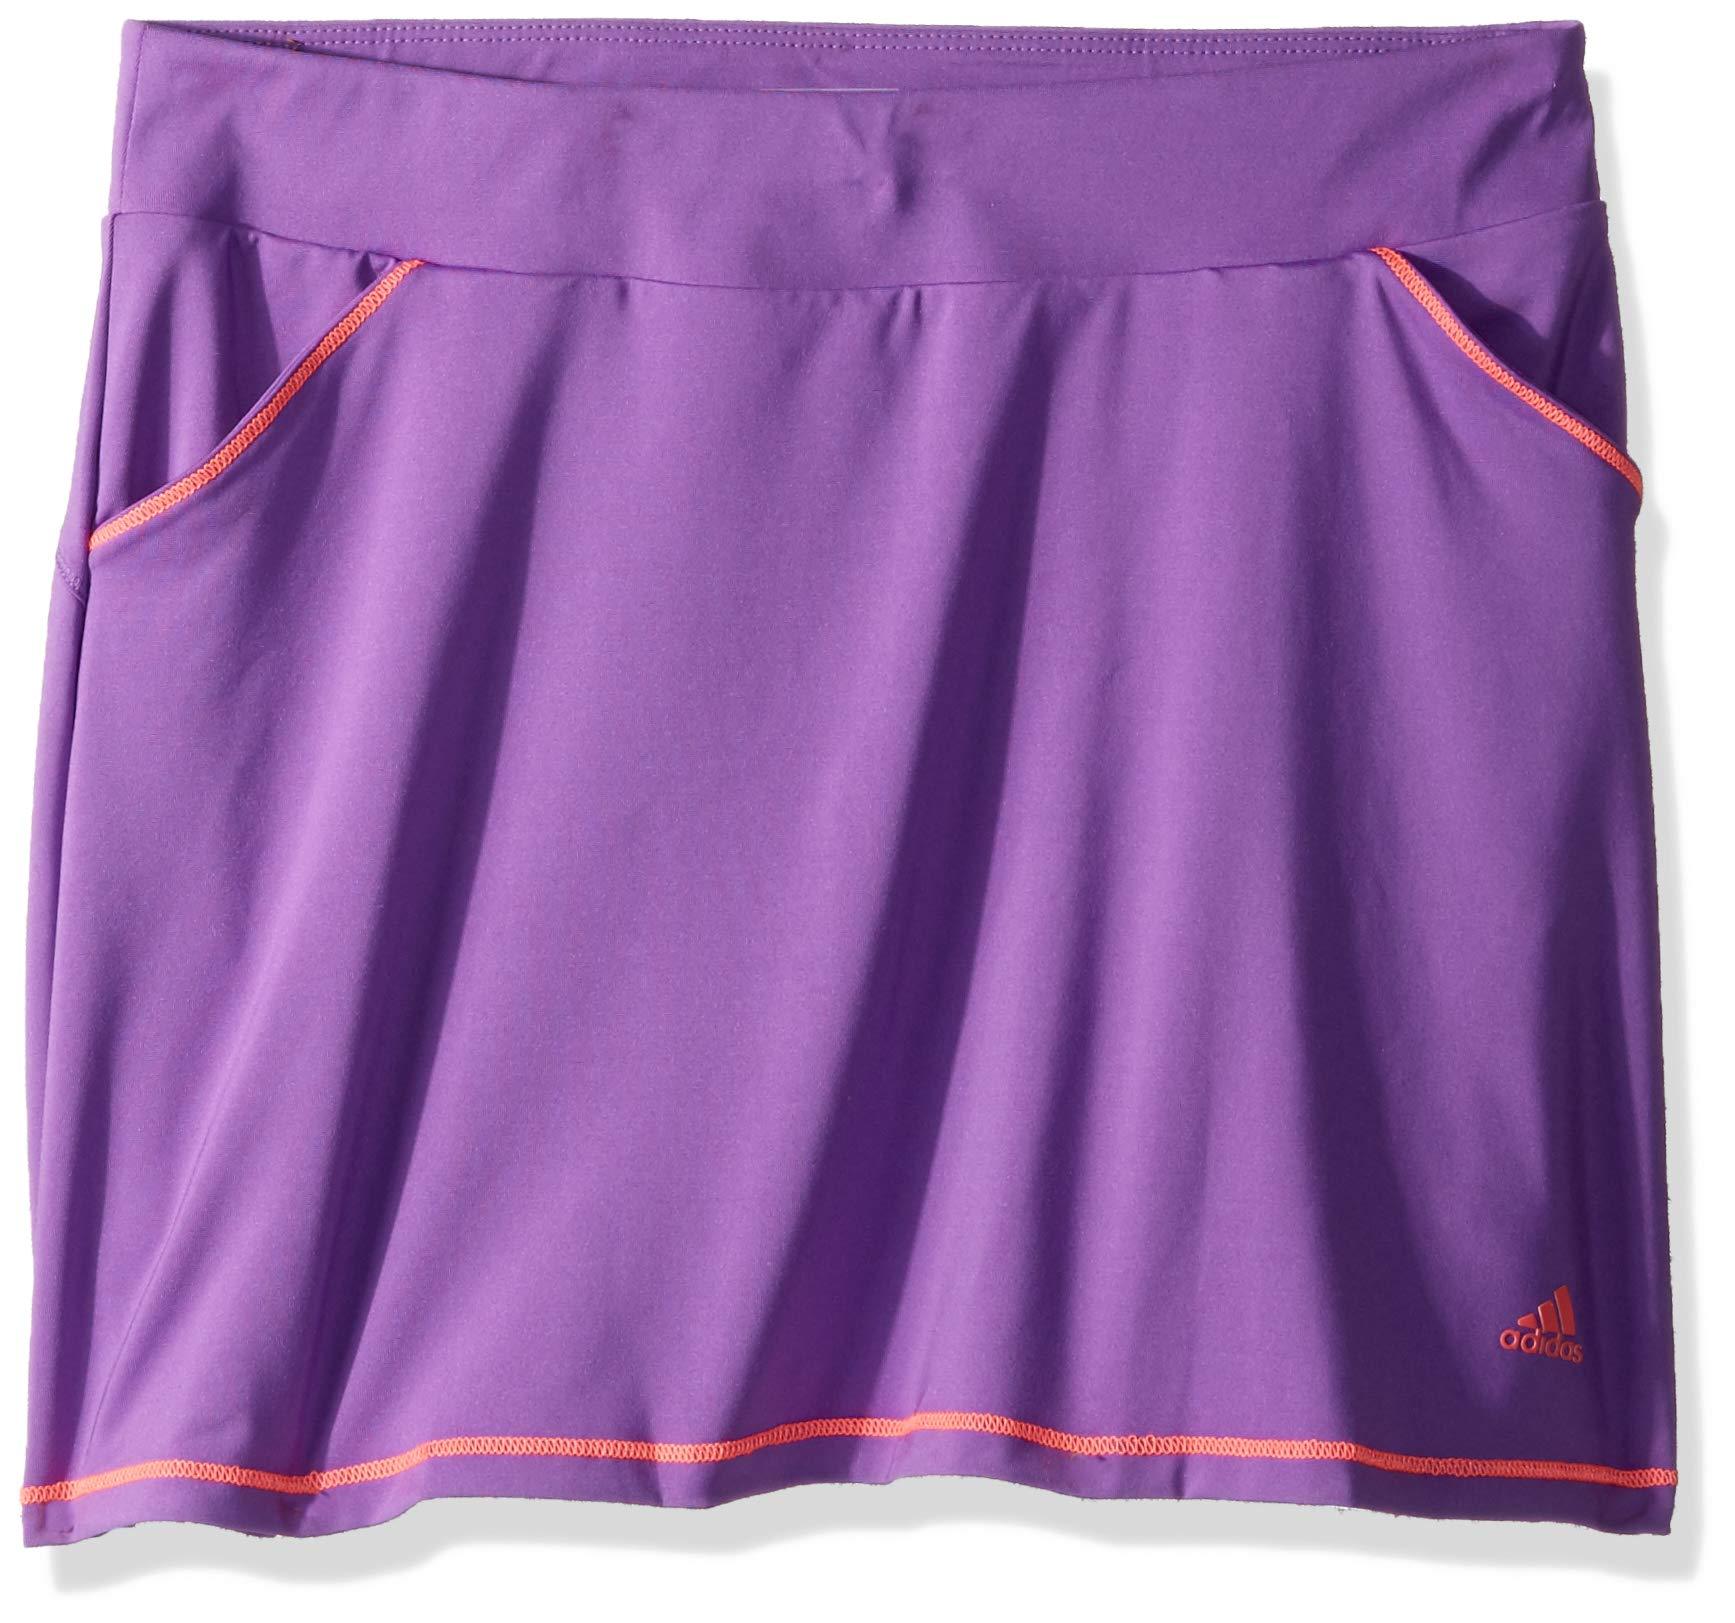 adidas Golf Printed Golf Skort, Active Purple, Medium by adidas